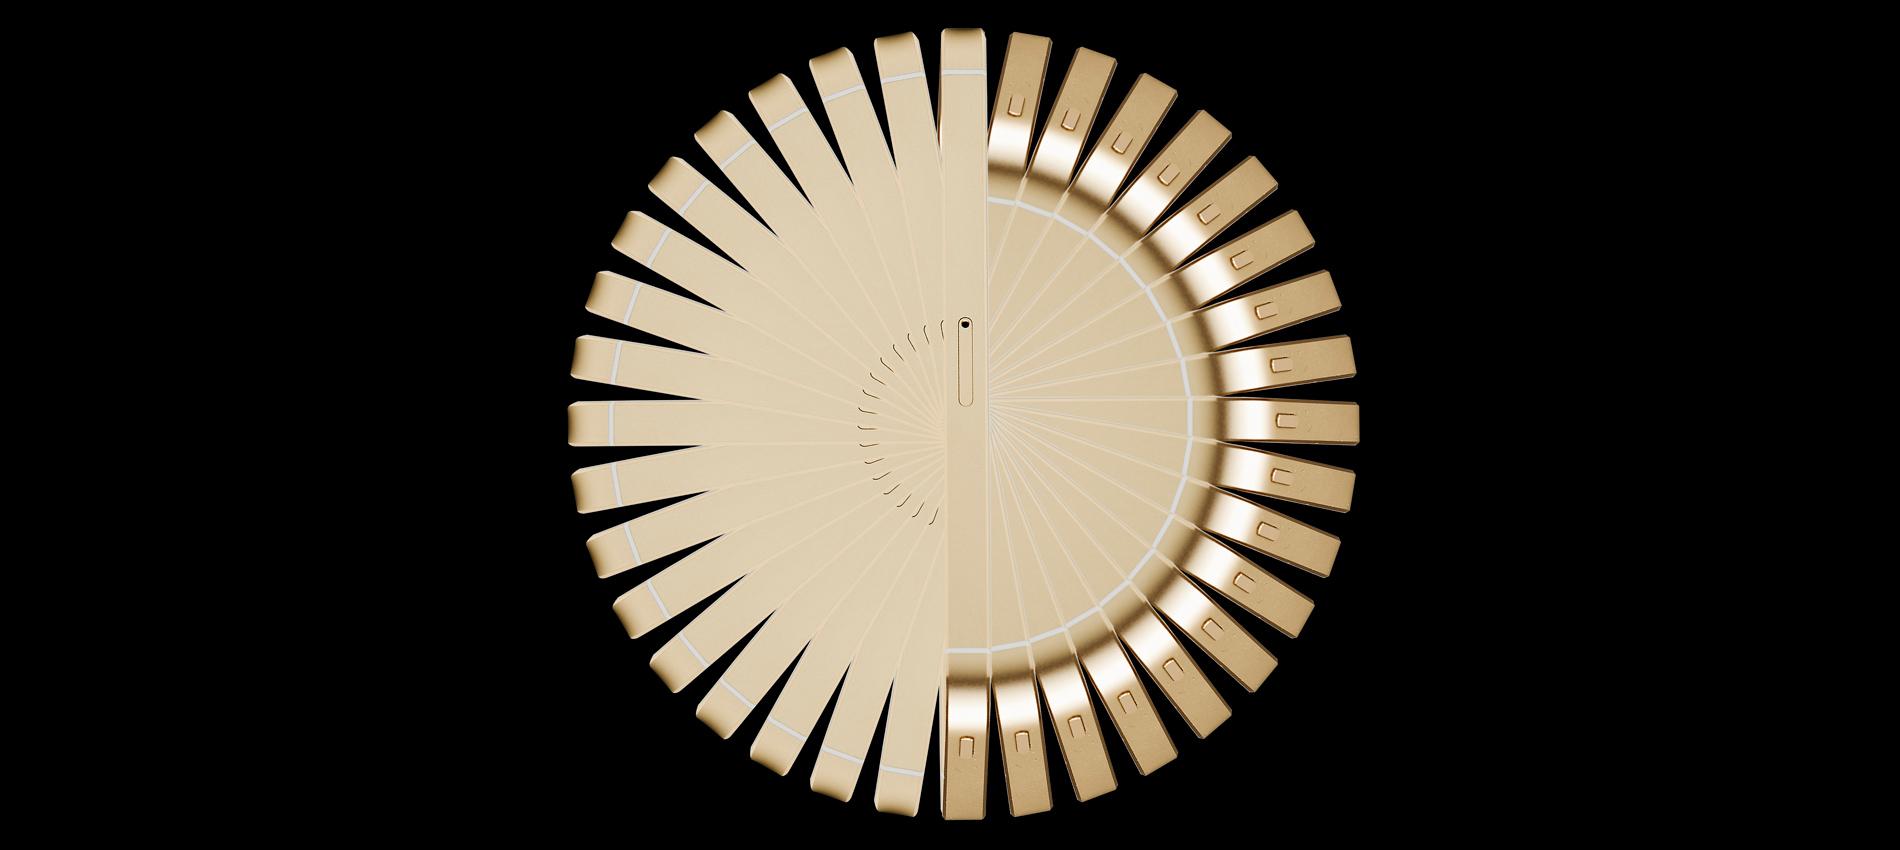 Möbel Penzberg möbel centrale penzberg nikolaus schaefflernikolaus schaeffler